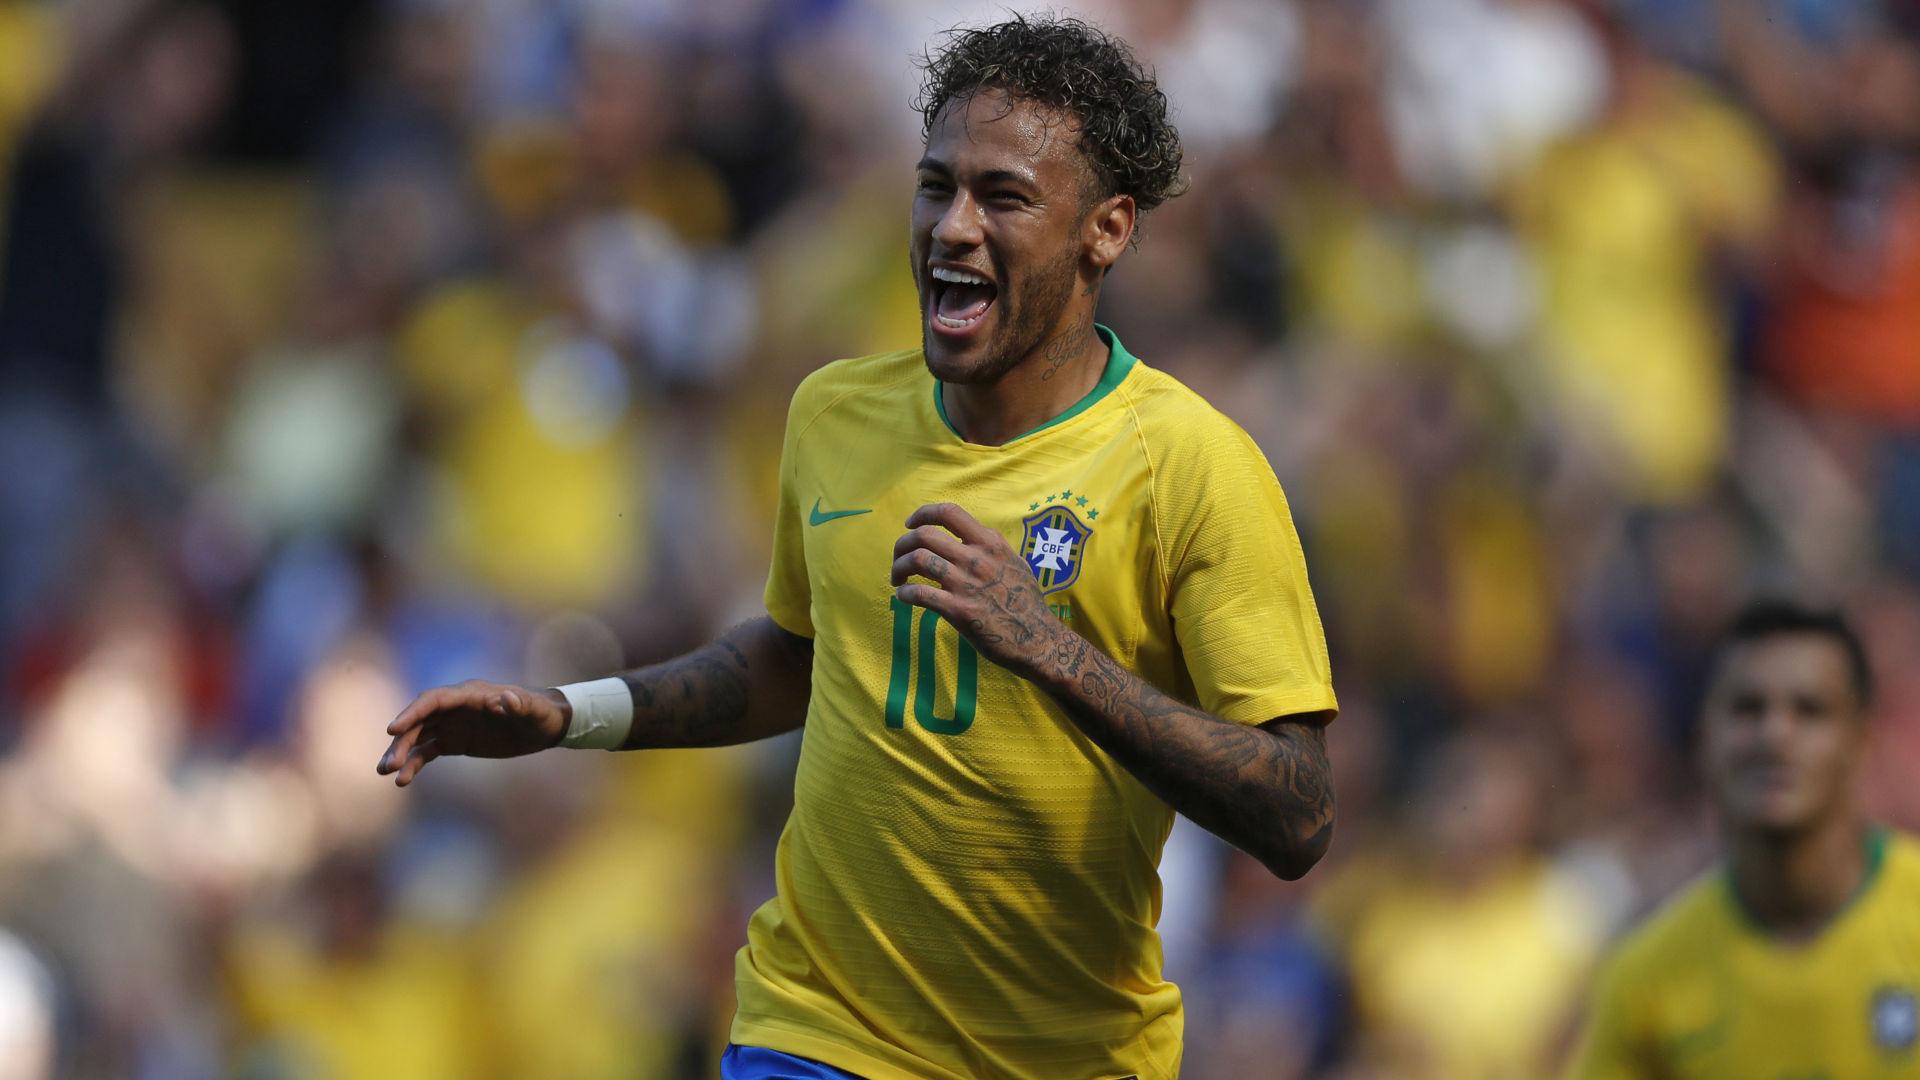 NEYMAR, Torna con il gol in Brasile-Croazia 2-0